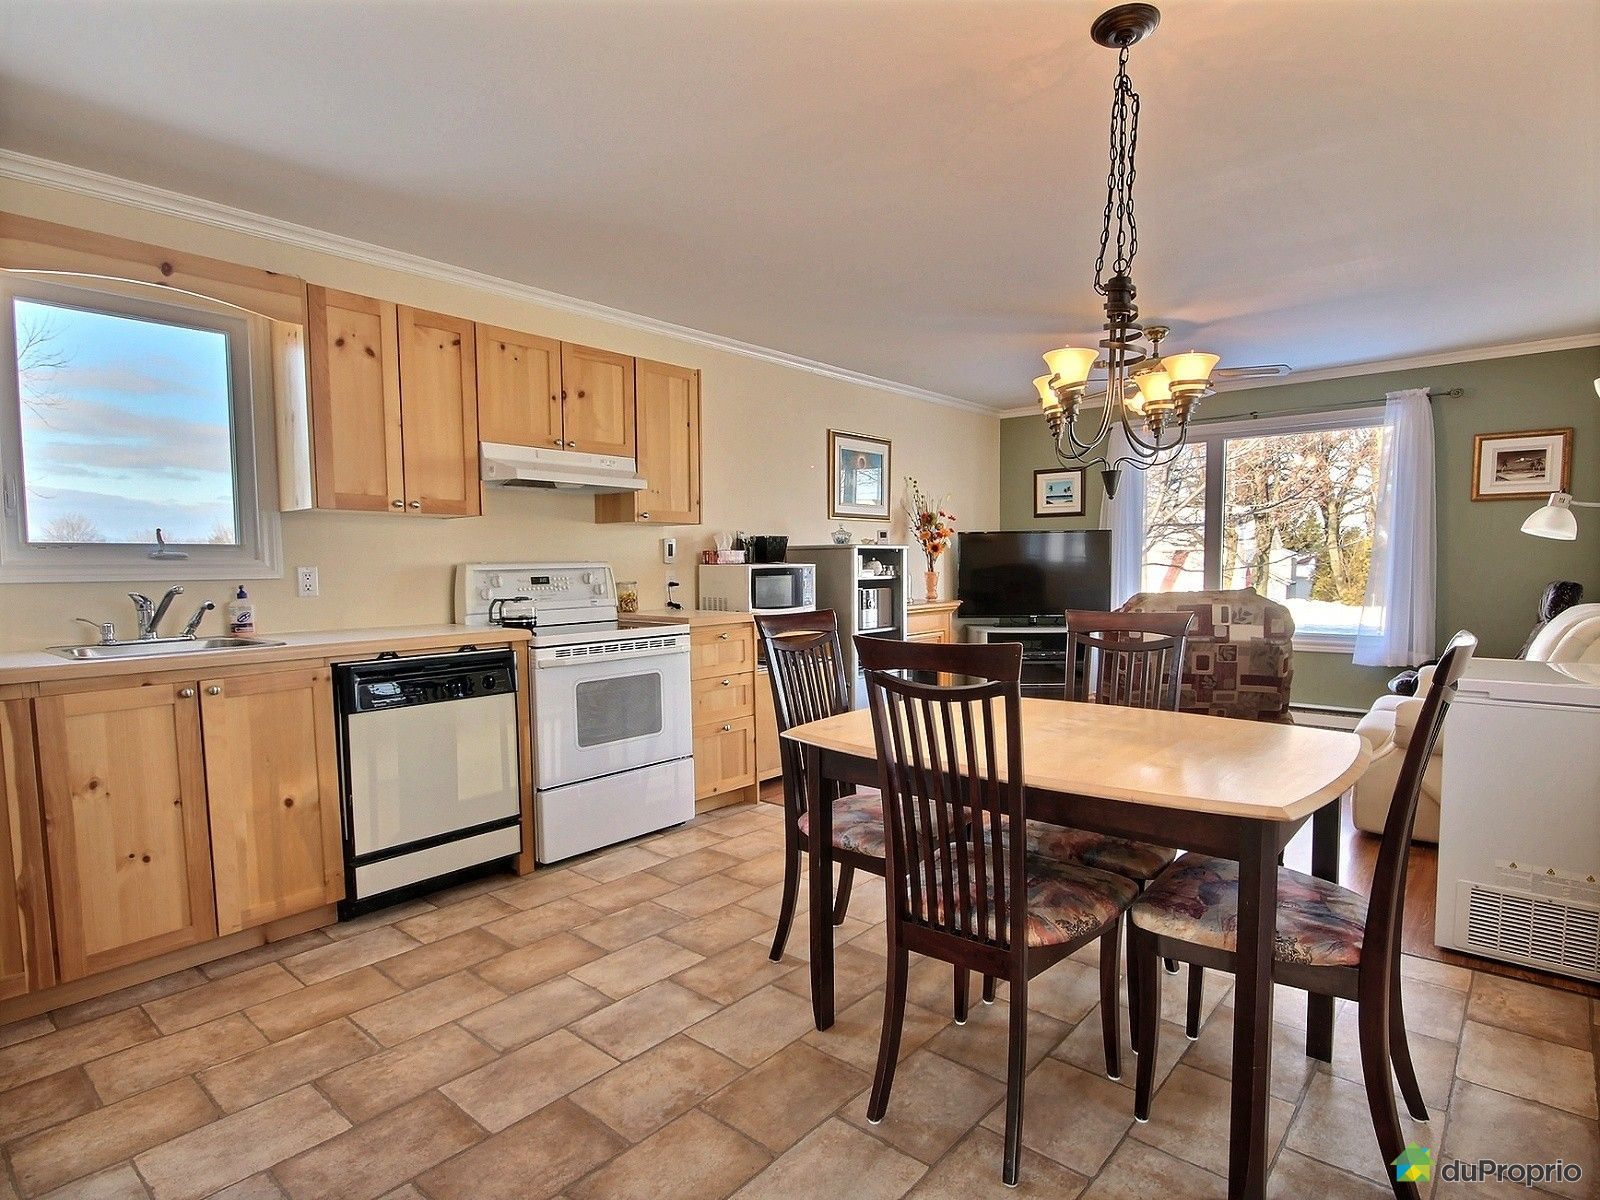 maison vendu l vis immobilier qu bec duproprio 688800. Black Bedroom Furniture Sets. Home Design Ideas